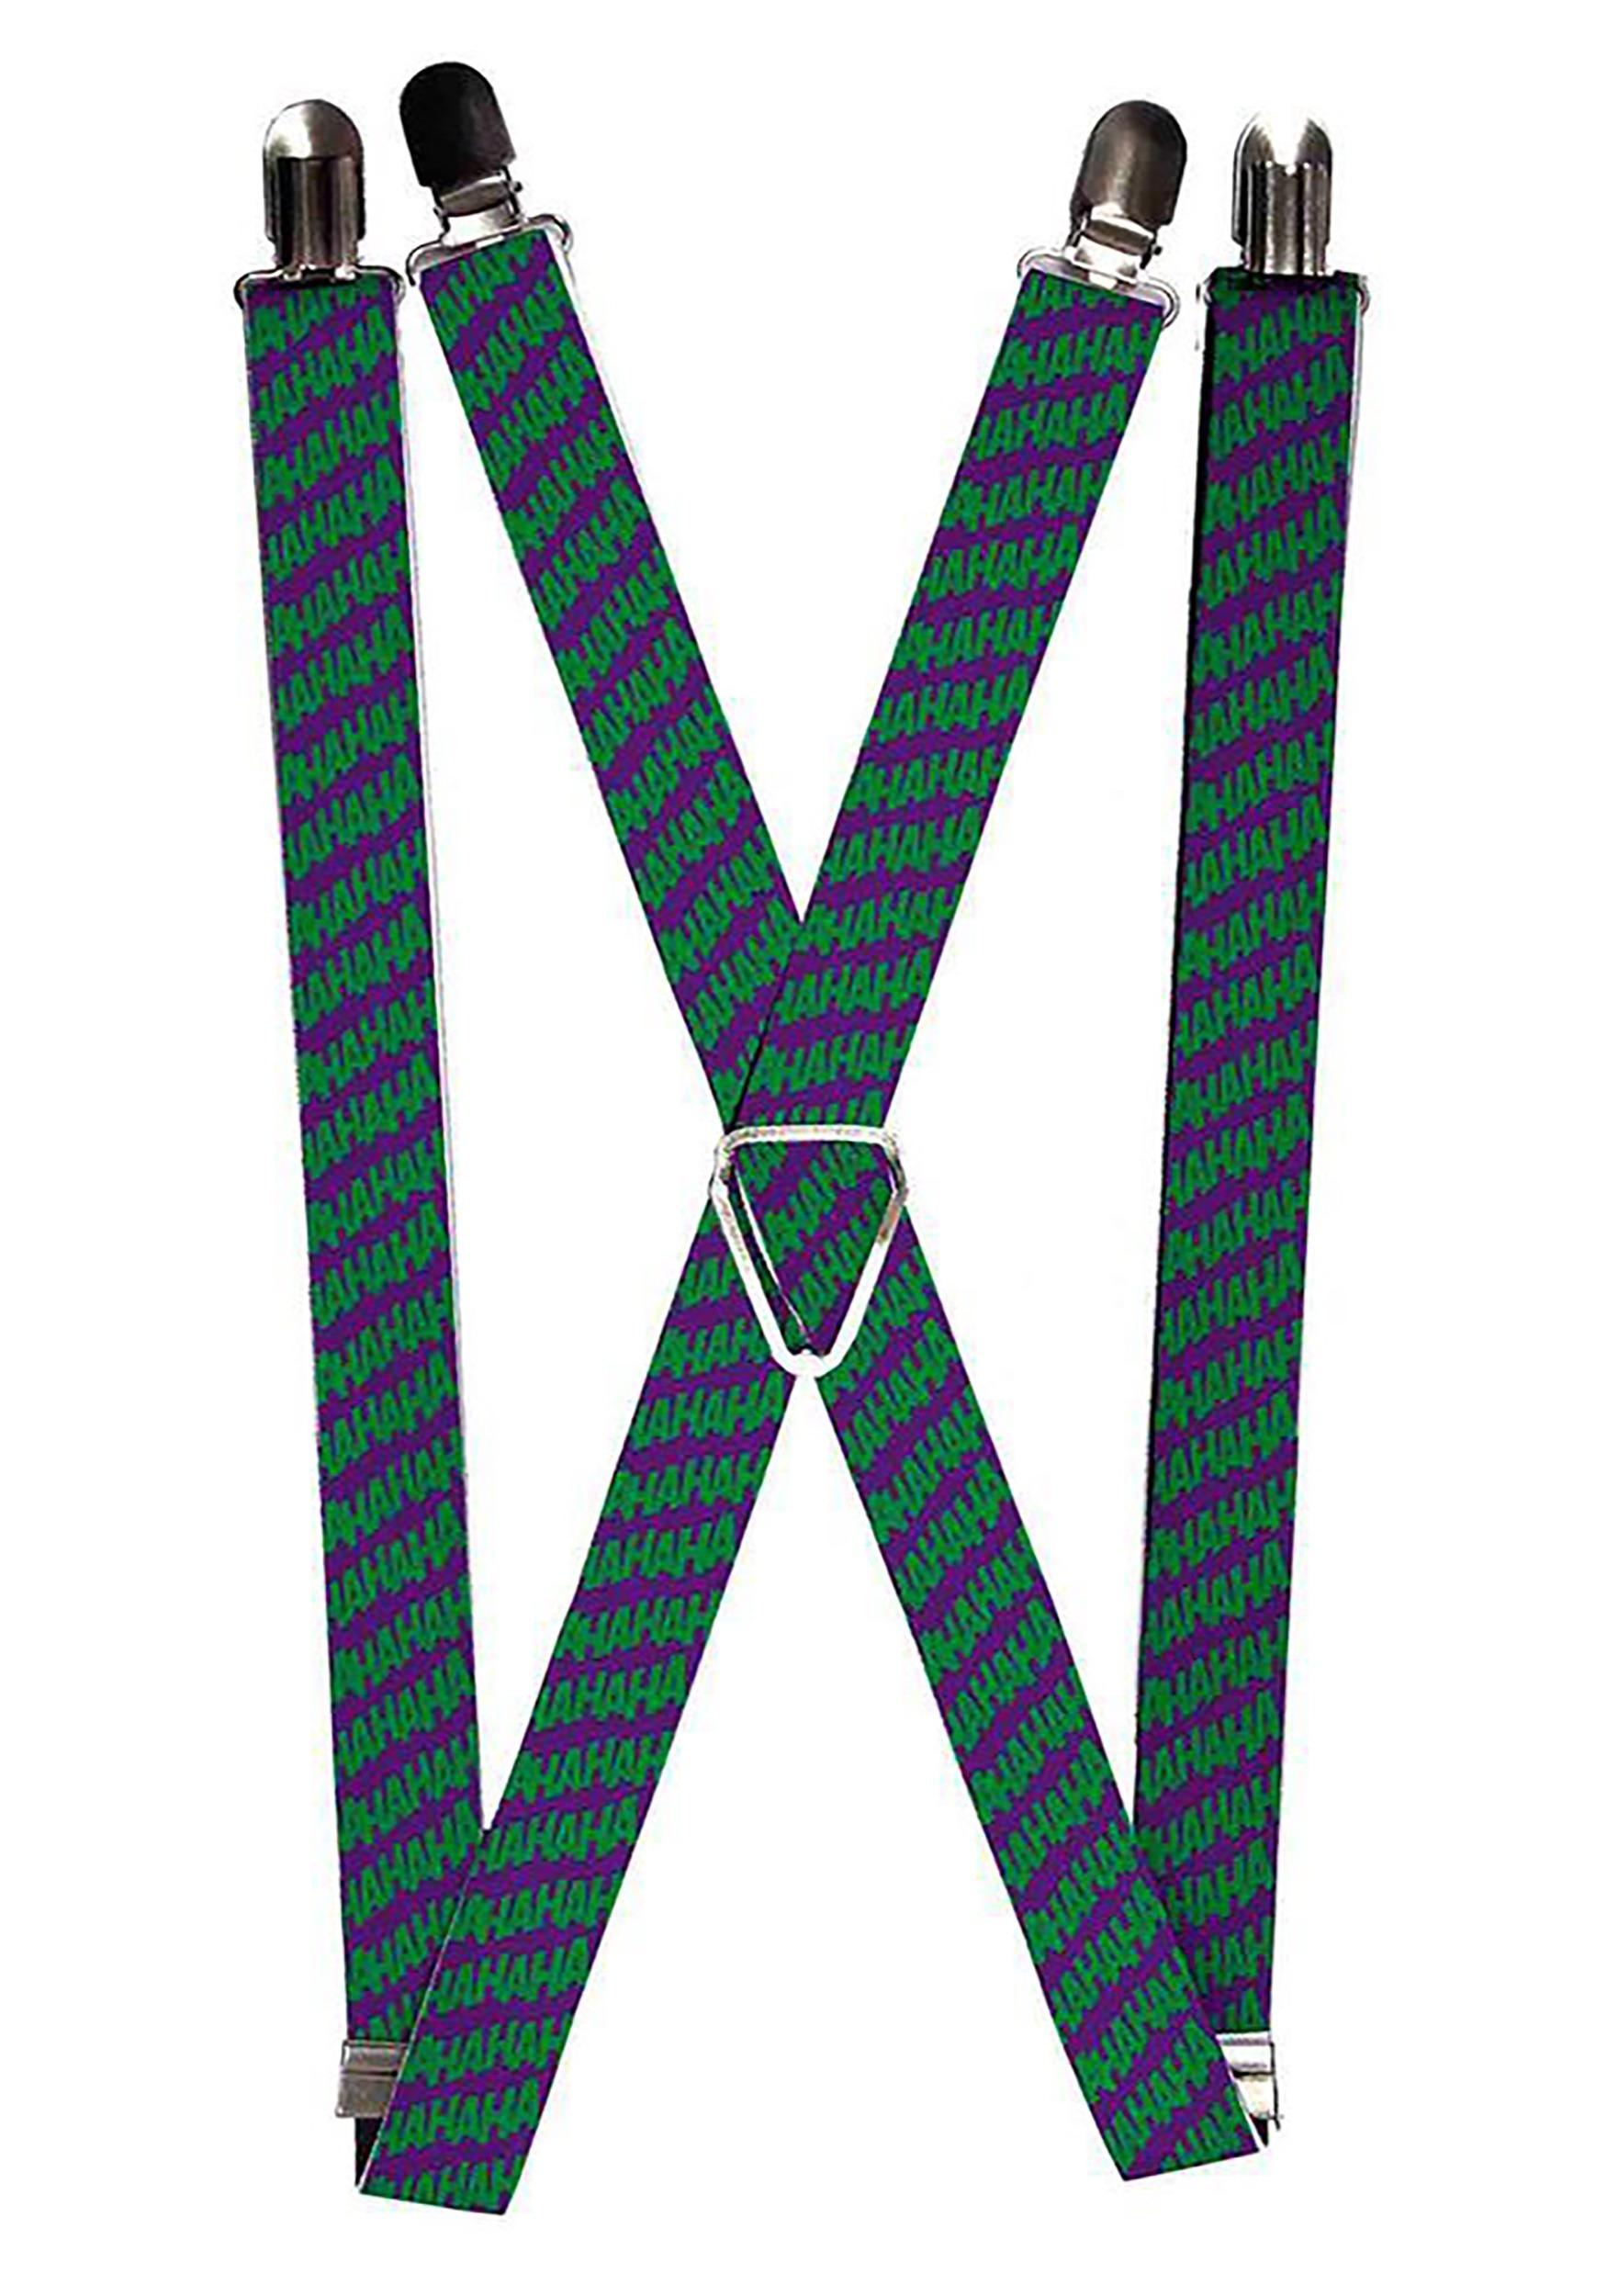 The_Joker_HaHaHa_Suspenders